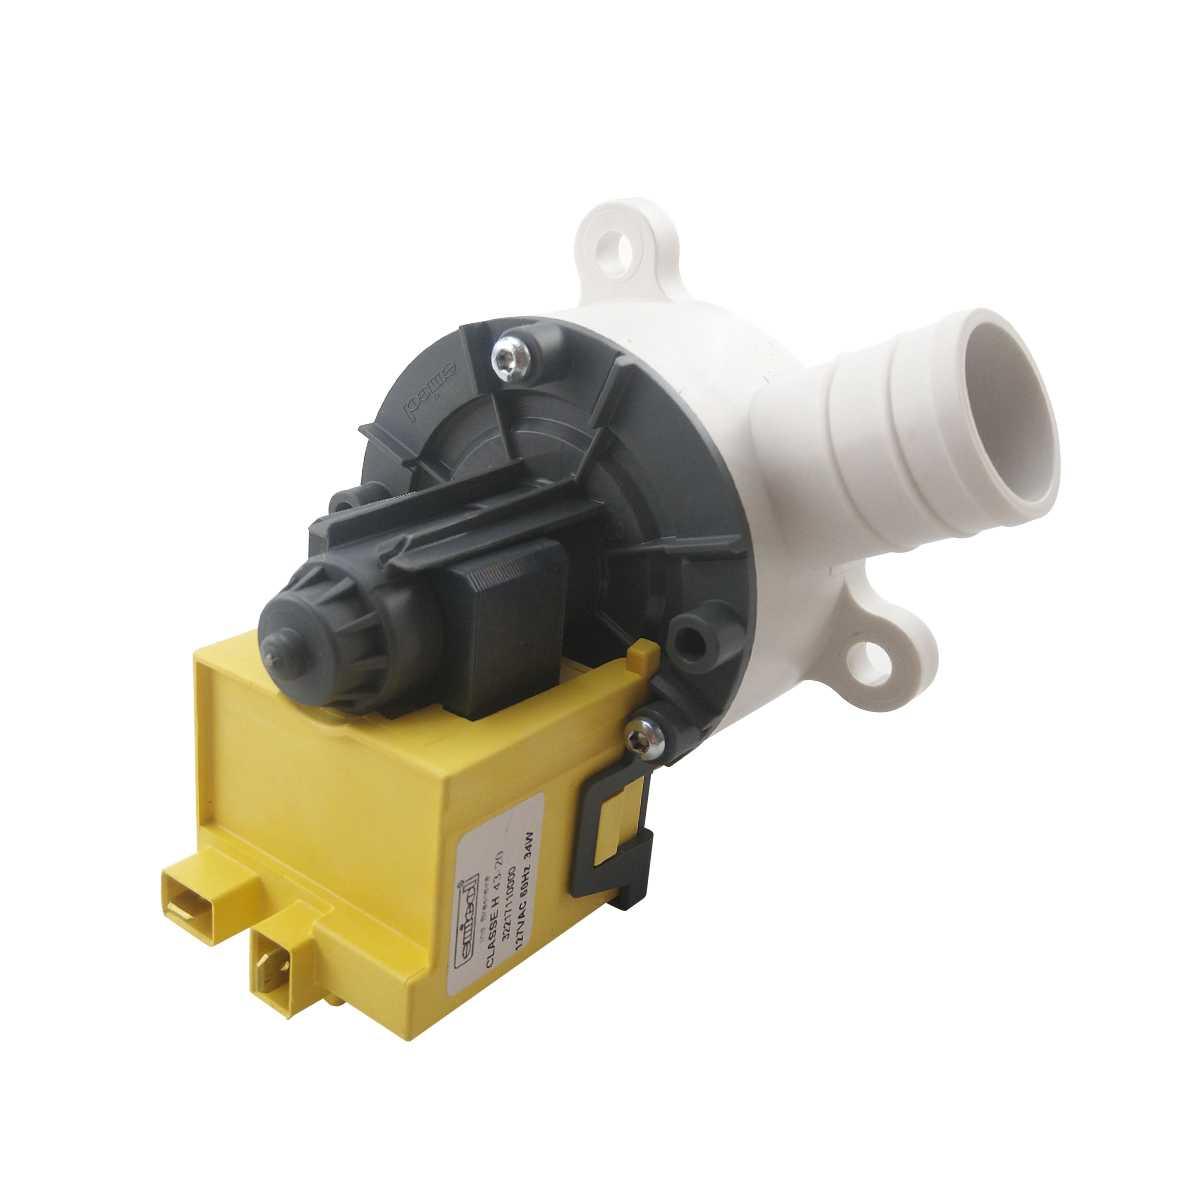 Eletrobomba para Lavadora de Roupas Electrolux LQ11 Lf11